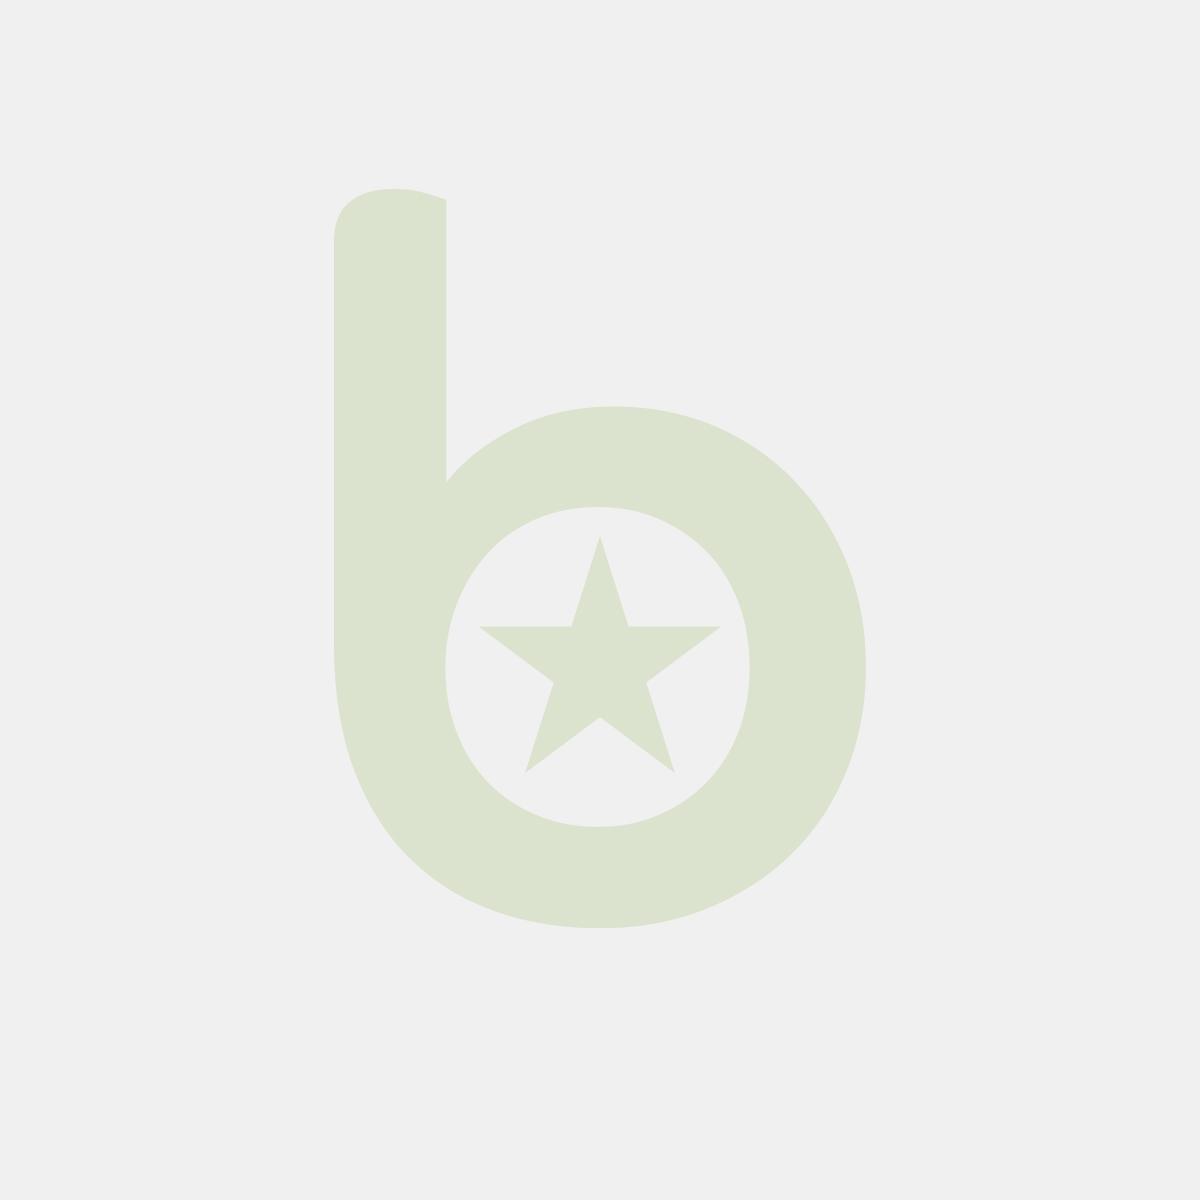 Nadstawa Chłodnicza Gn 1/3 7 X Gn 1/3